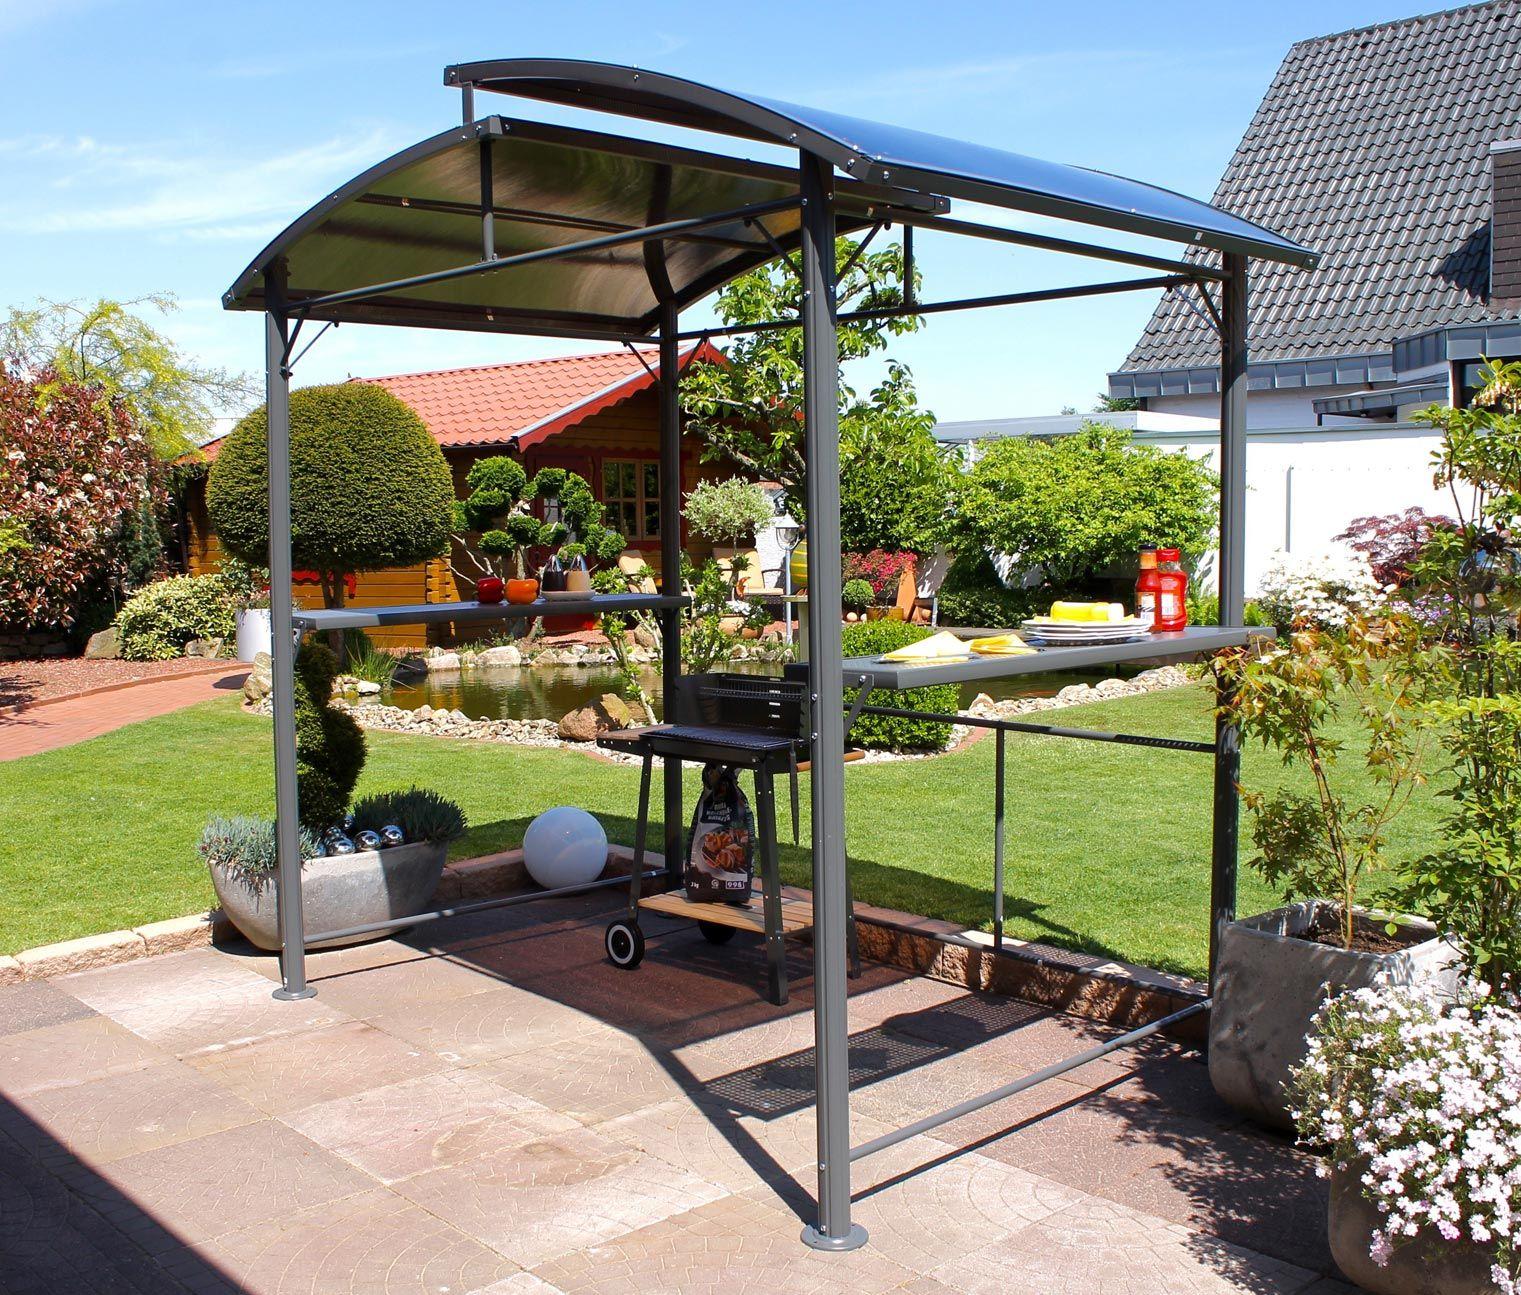 Leco Profi Grillpavillon Grill Pavillon Pavillon Whirlpool Garten